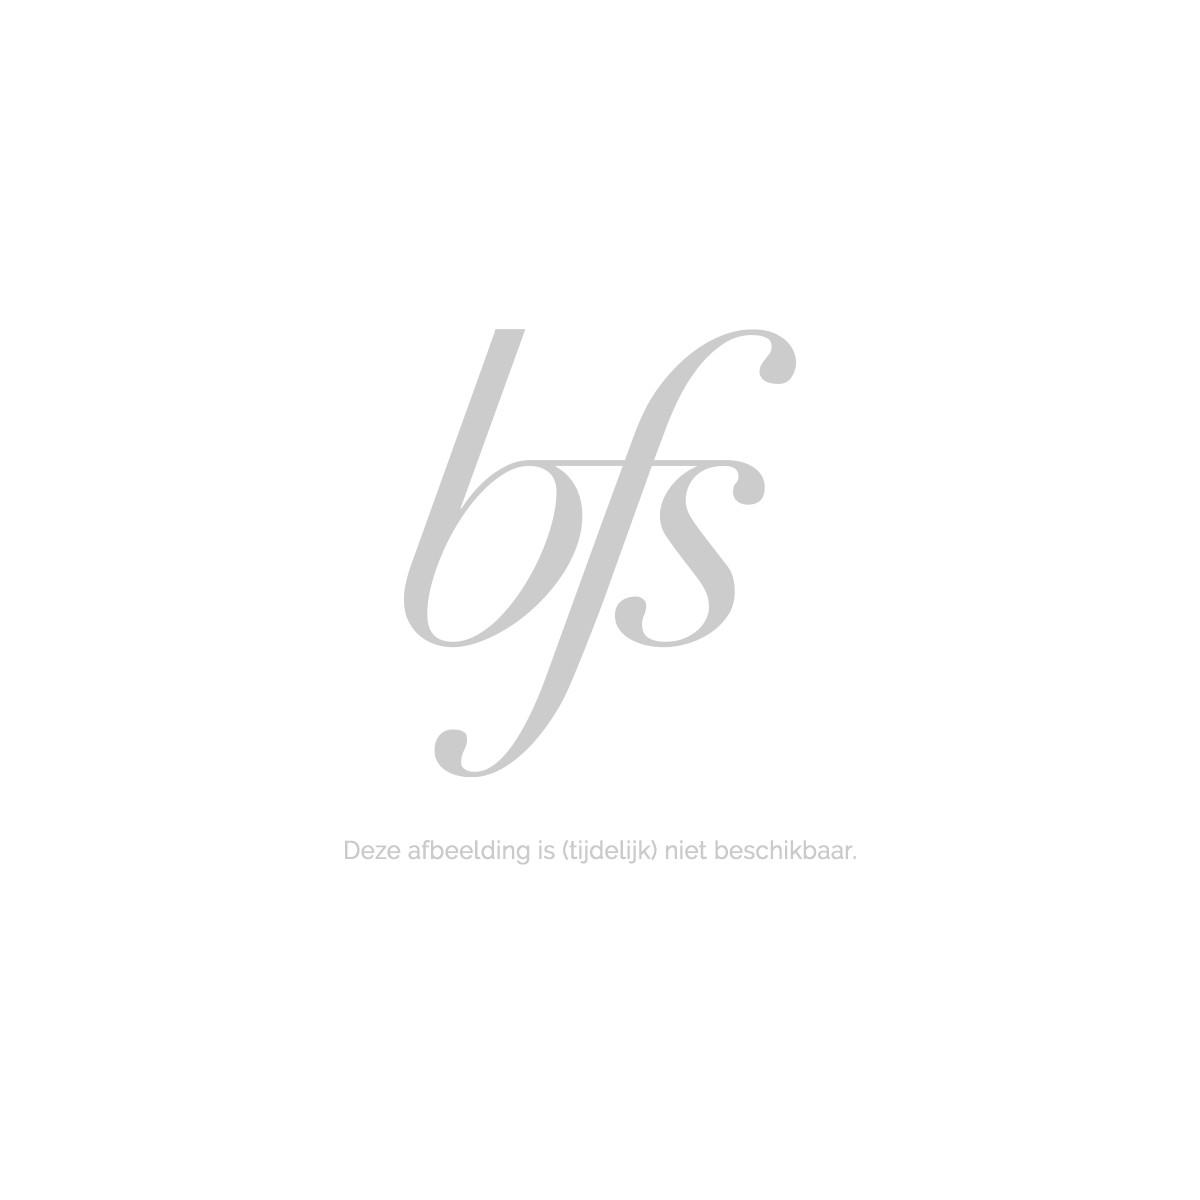 Beardburys Tondeuse Final Shaver Pro